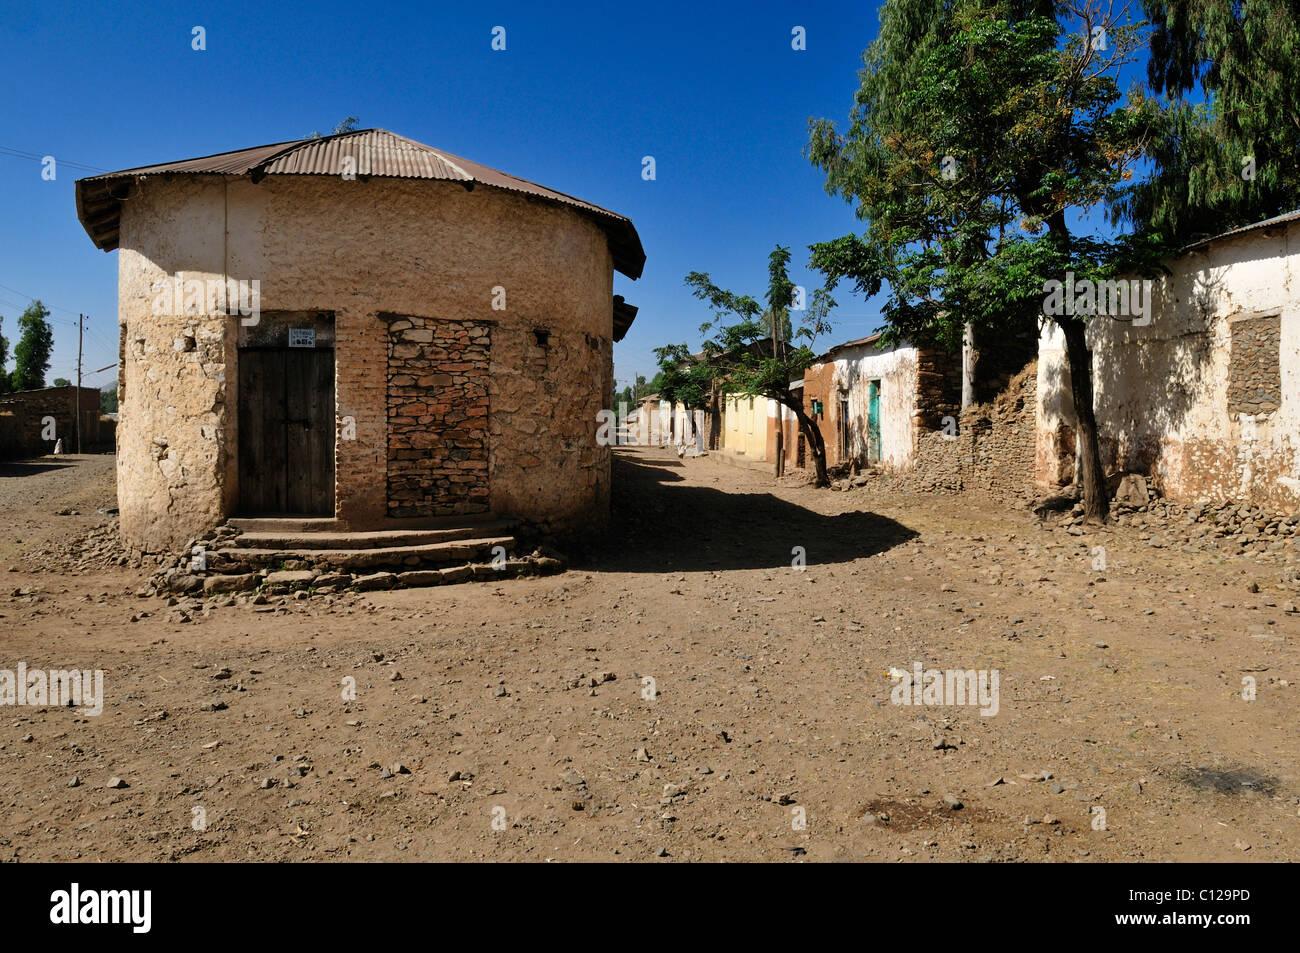 Dusty lane in the historic town of Aksum, Axum, UNESCO World Heritage Site, Tigray, Ethiopia, Africa - Stock Image